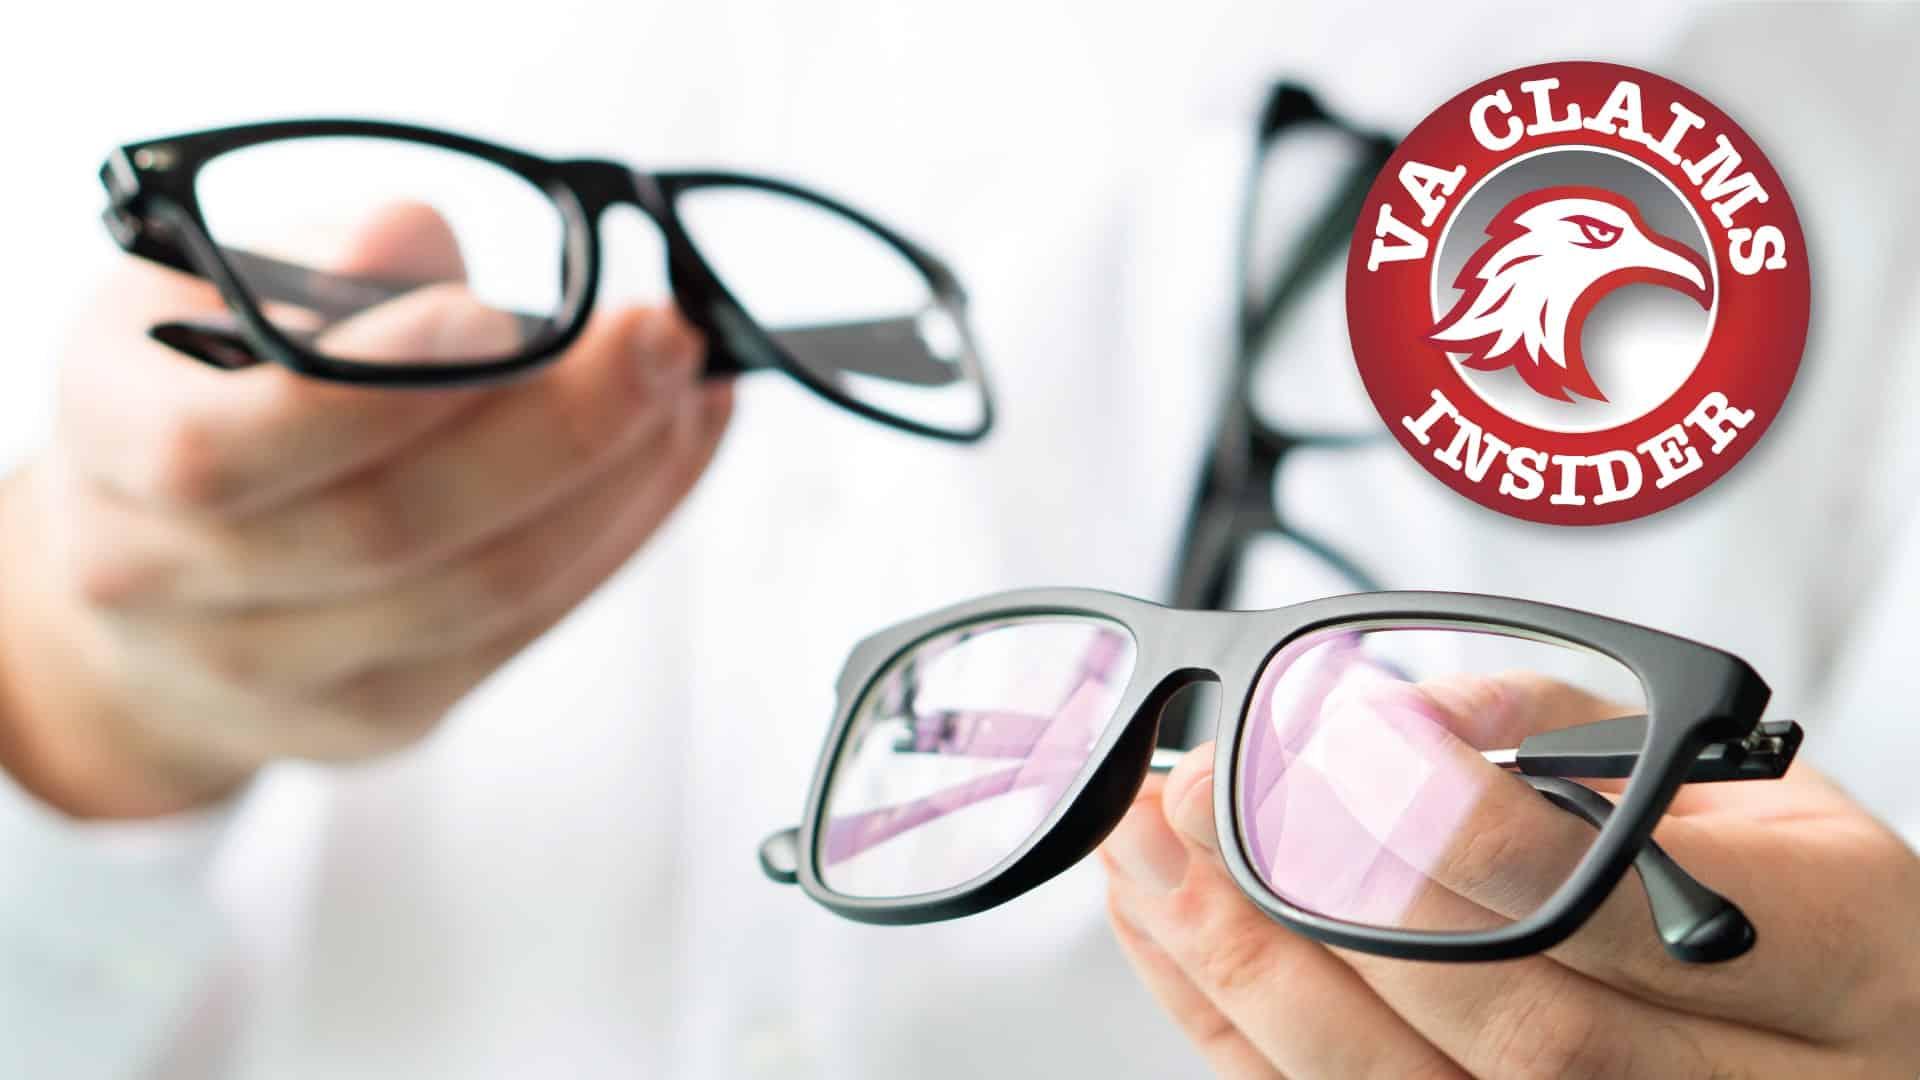 Eyewear Discounts for Veterans - VA Claims Insider